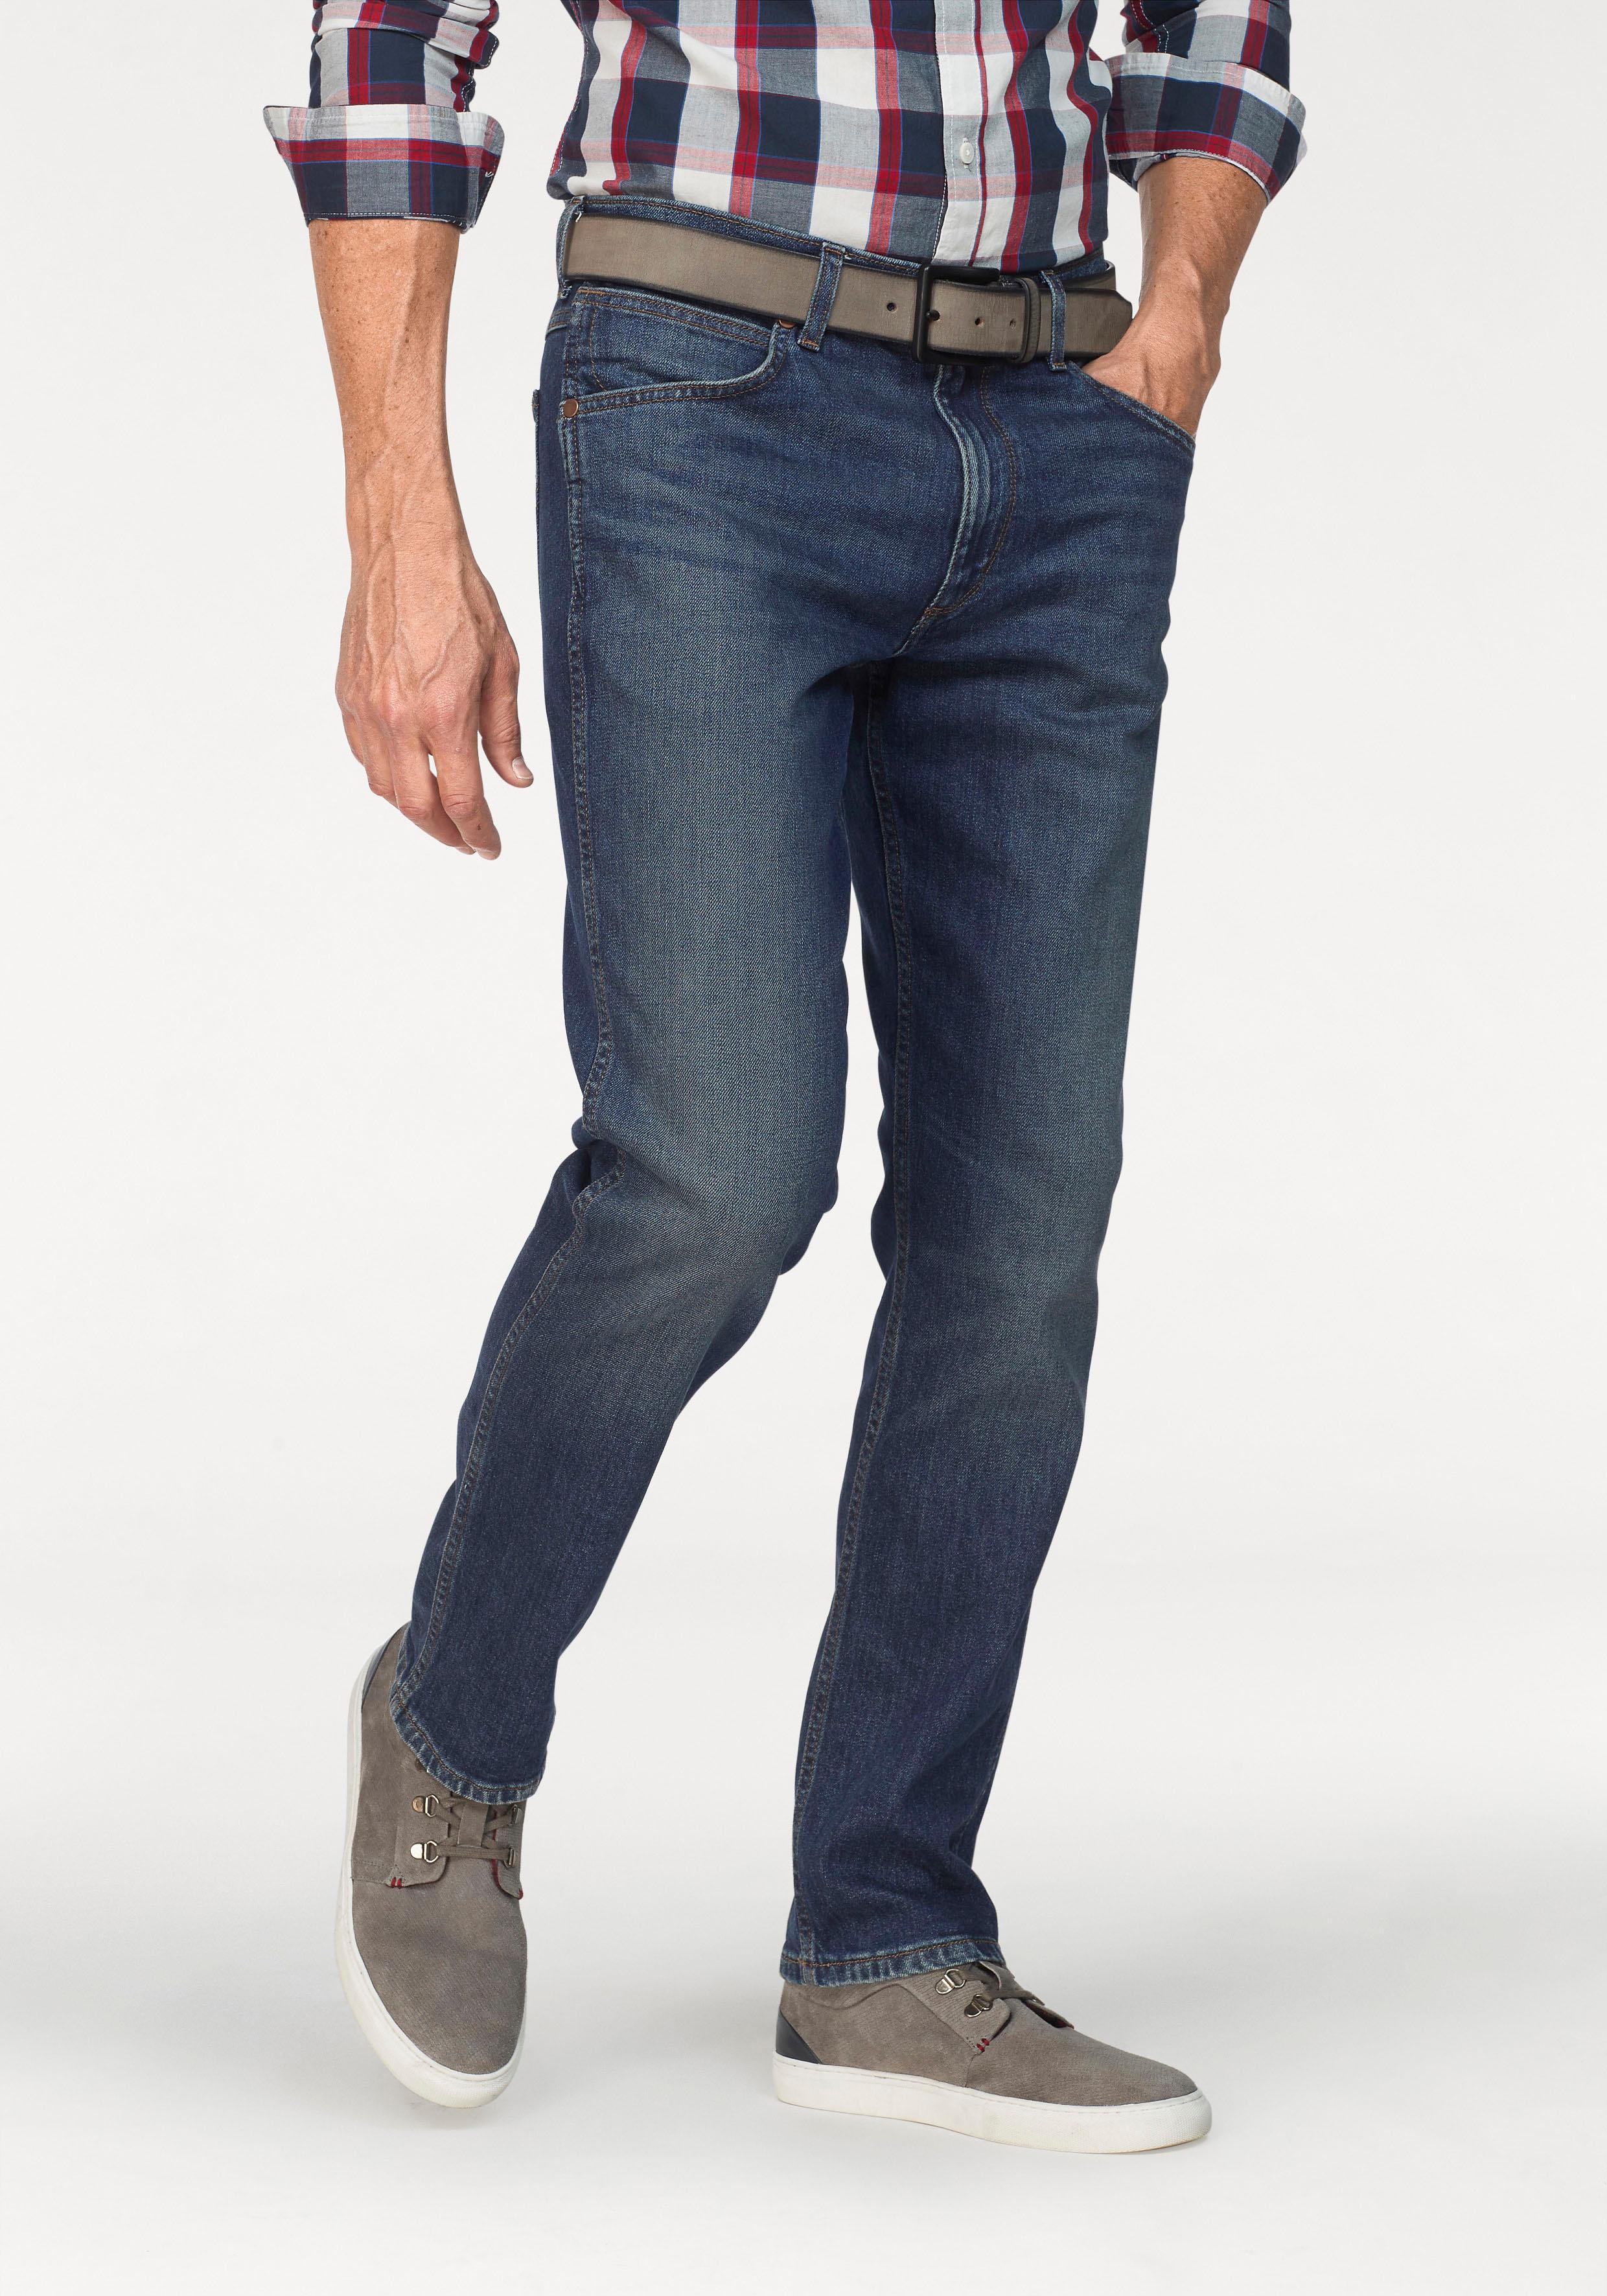 Wrangler Stretch-Jeans Greensboro | Bekleidung > Jeans > Stretch Jeans | Blau | Jeans | Wrangler